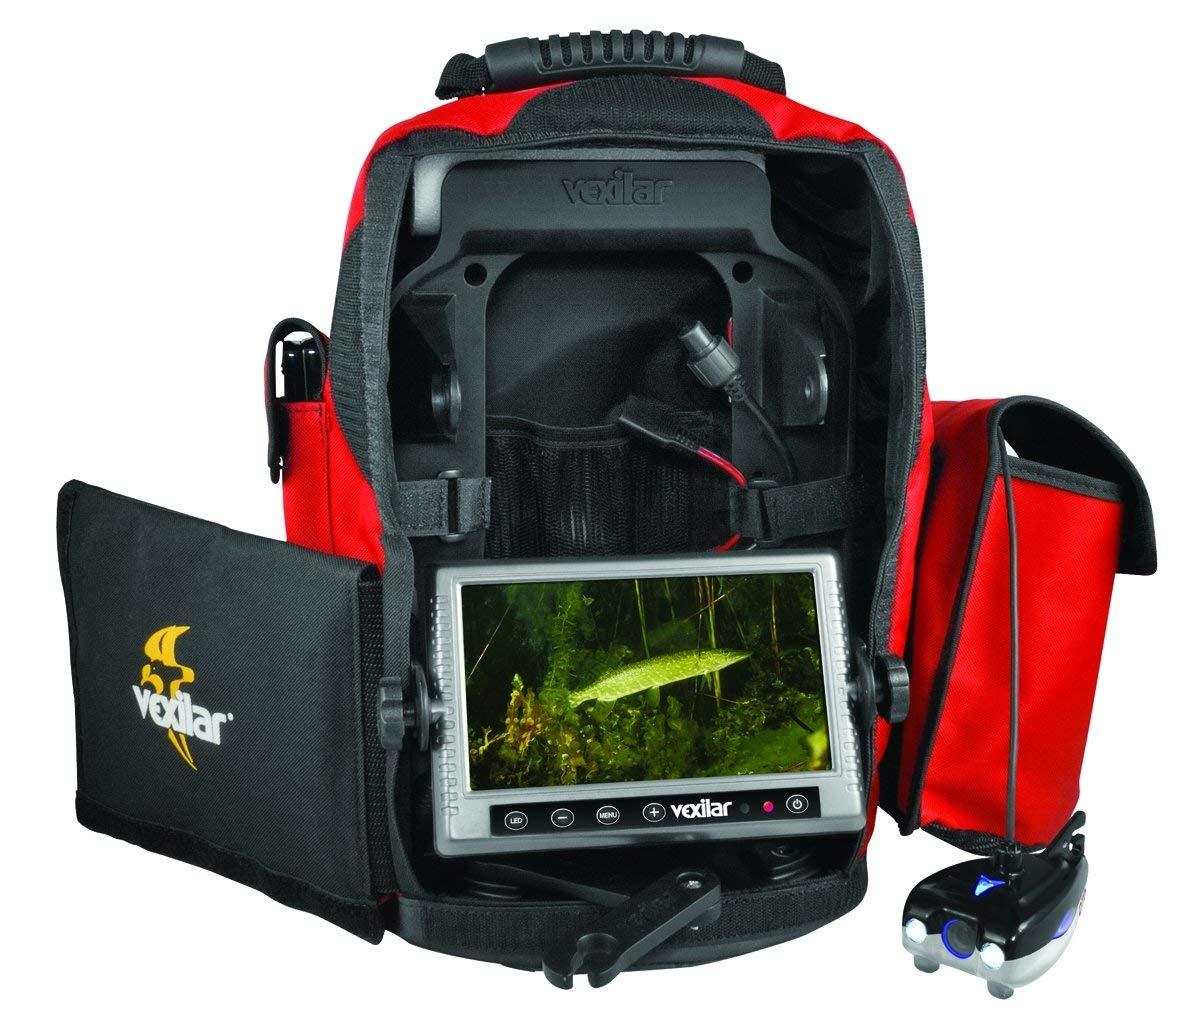 Vexilar Color Underwater Camera with DTD